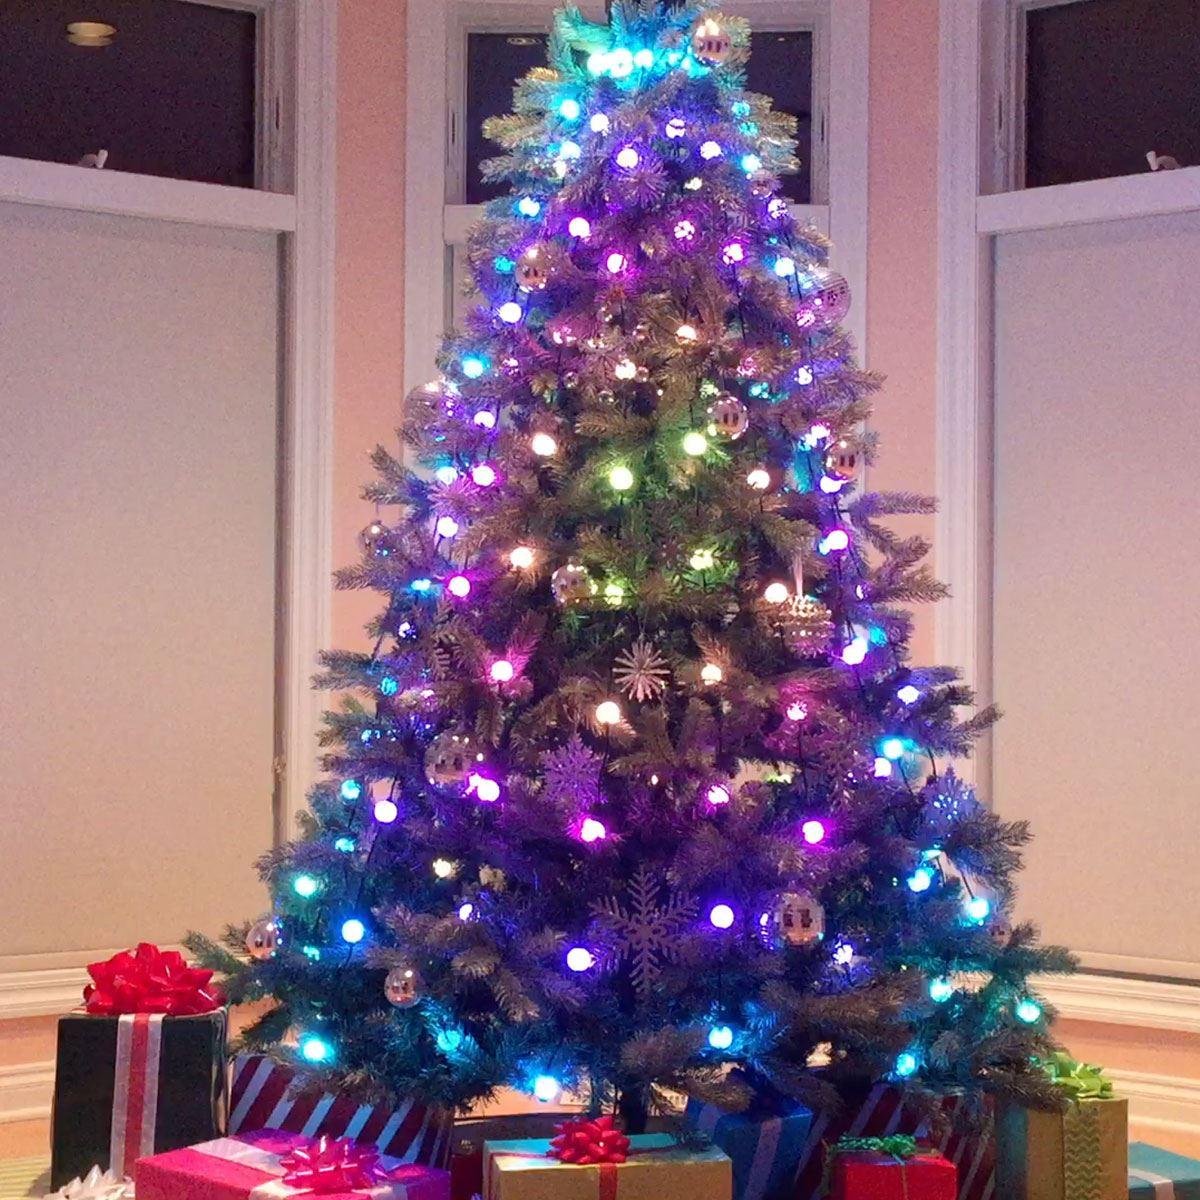 Starter 80 Animated Christmas Tree GlowBalls Light Show By ...